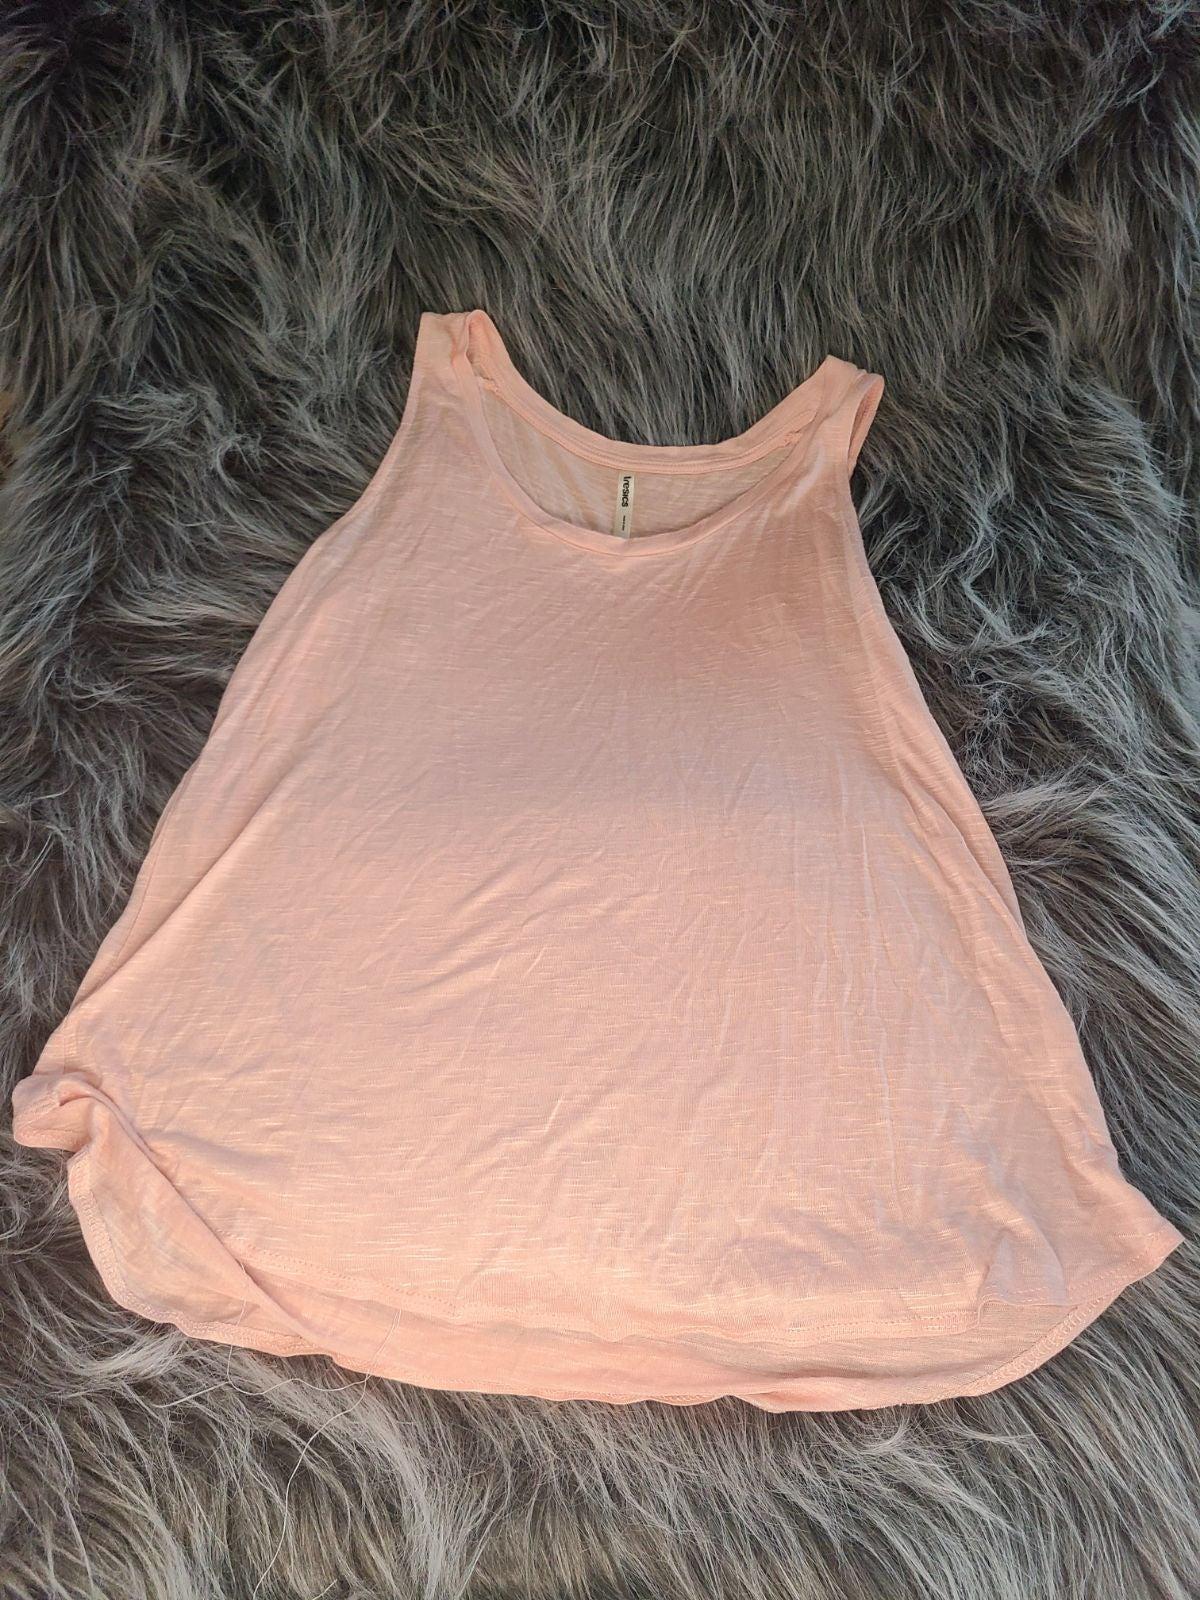 Tresics medium pink sleeveless top